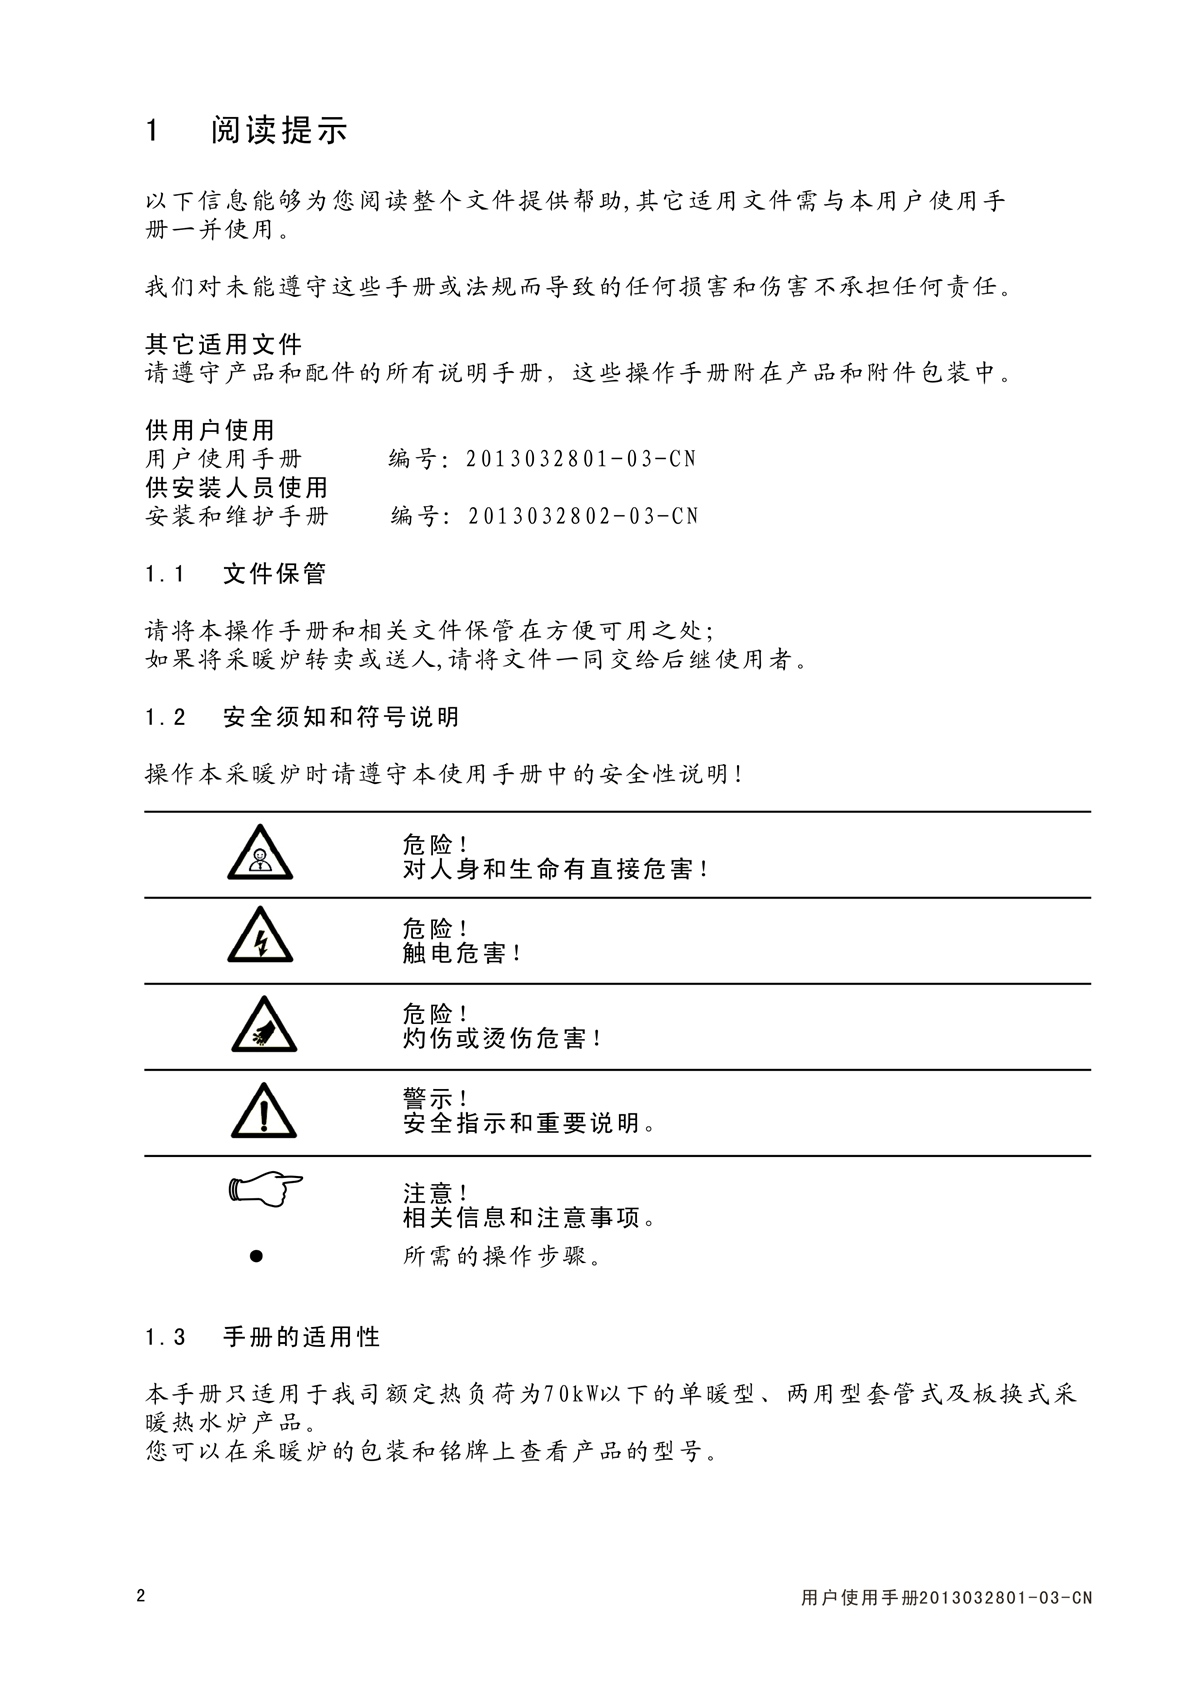 ES16B系列-用户使用手册-3_01.jpg